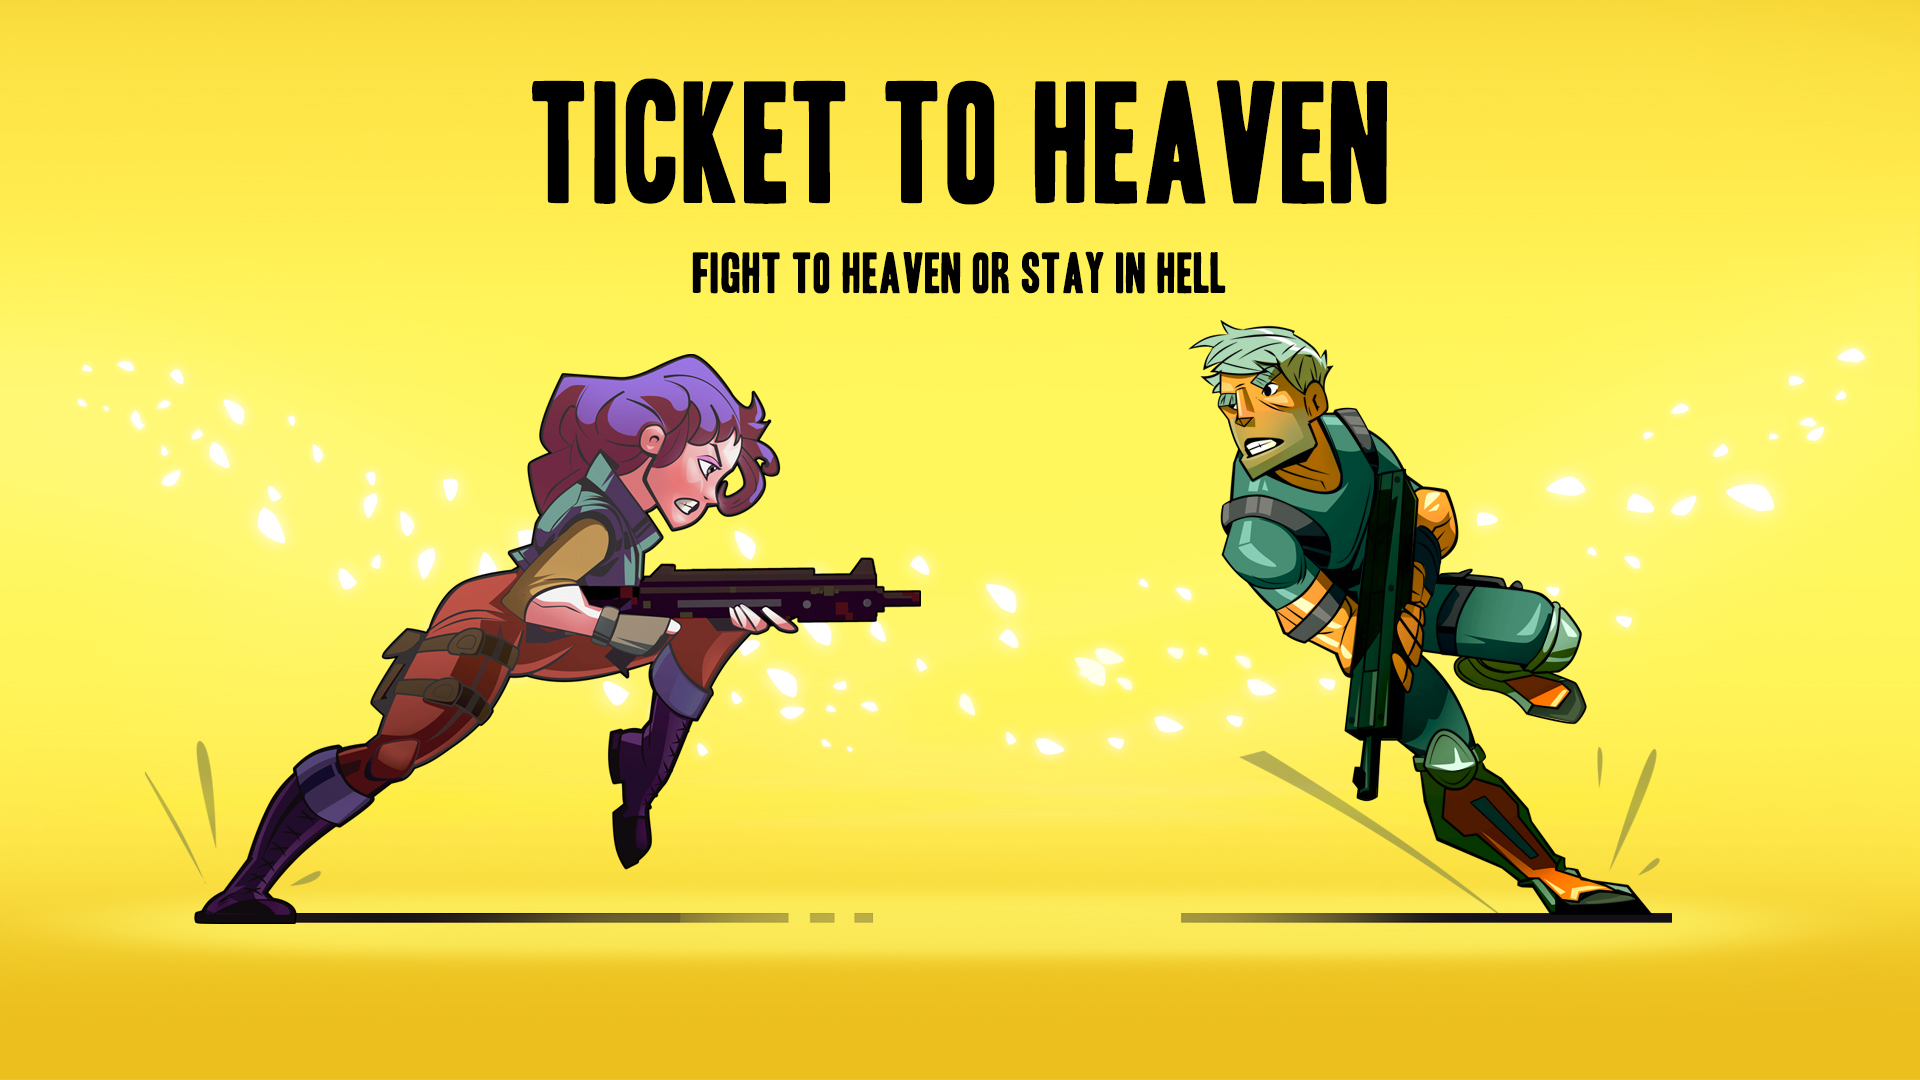 کمپین کیک استارتر بازی Ticket to Heaven